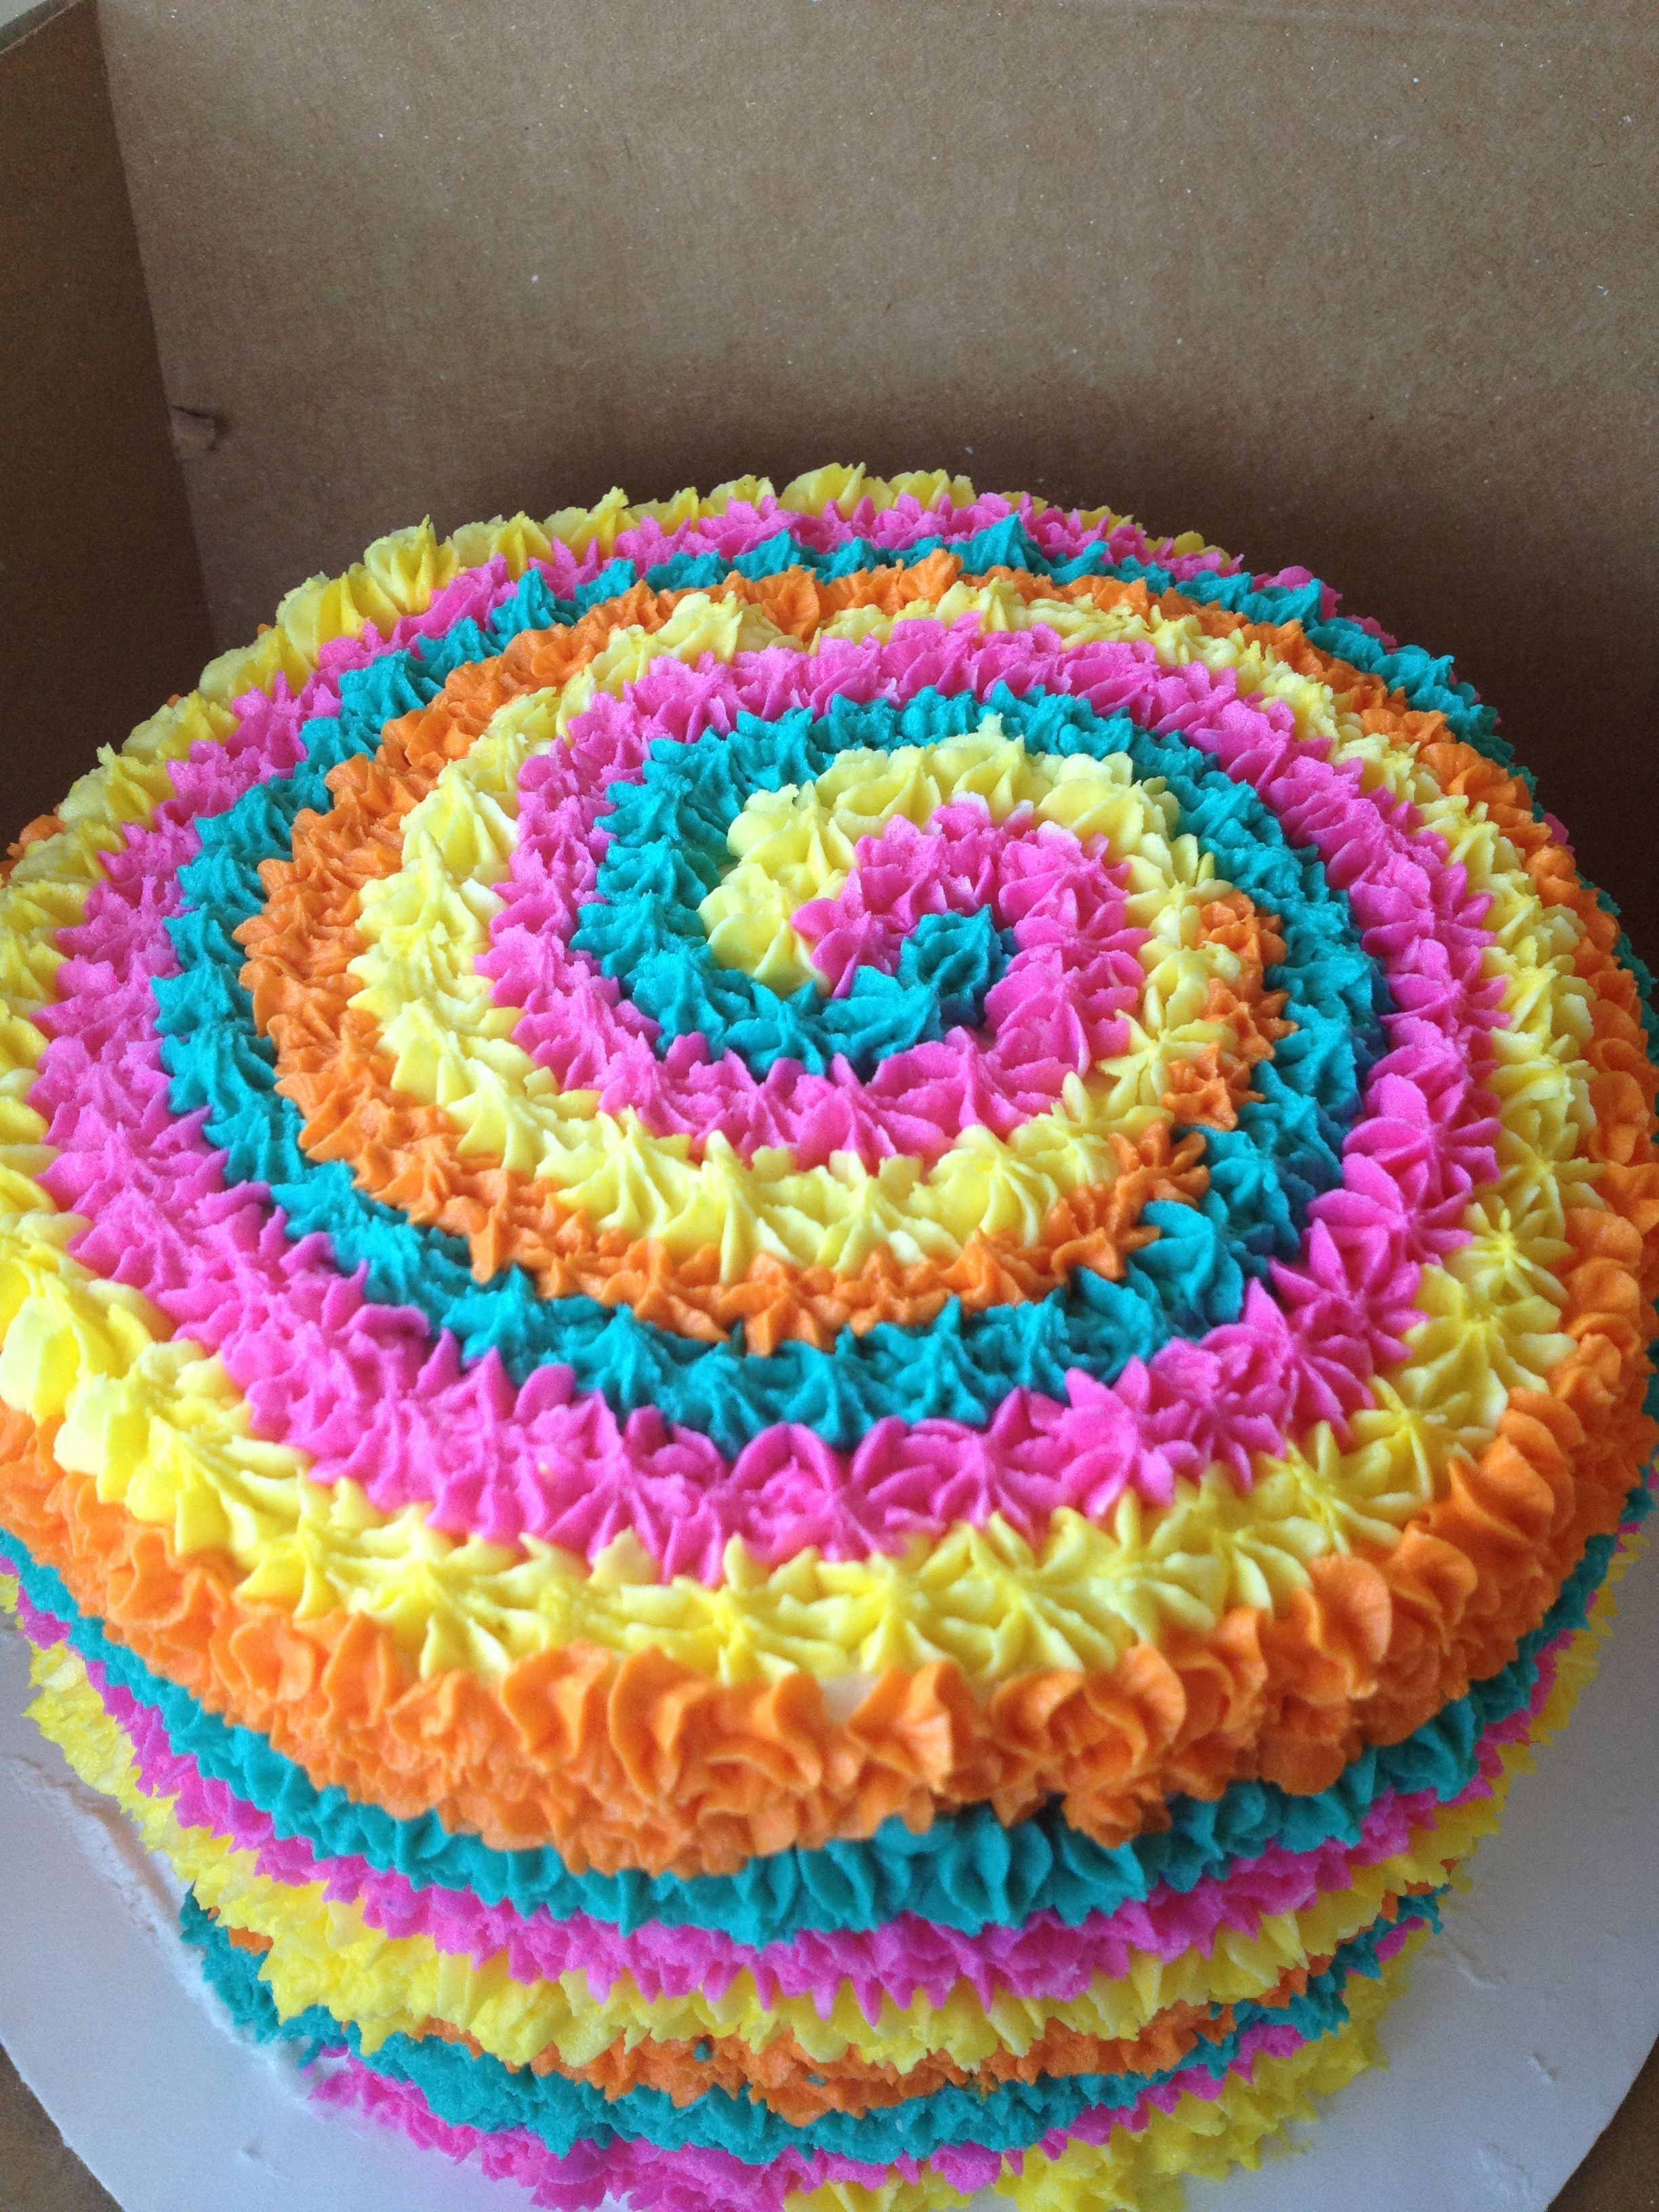 Fun Cake Tie Dye Hmmm Baby Gender Reveal Party